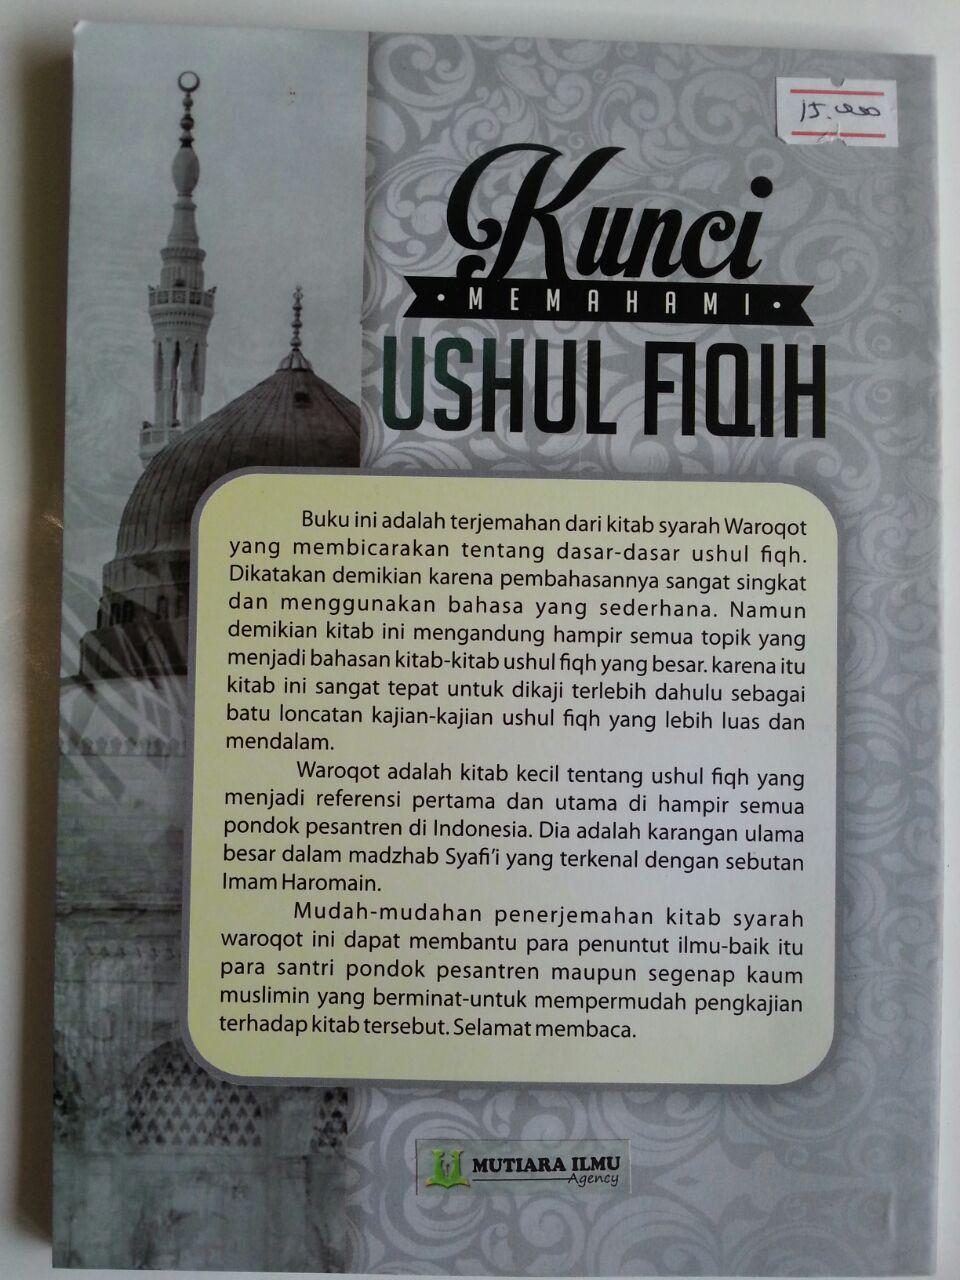 Buku Terjemah Syarah Waroqot Kunci Memahami Ushul Fiqh cover